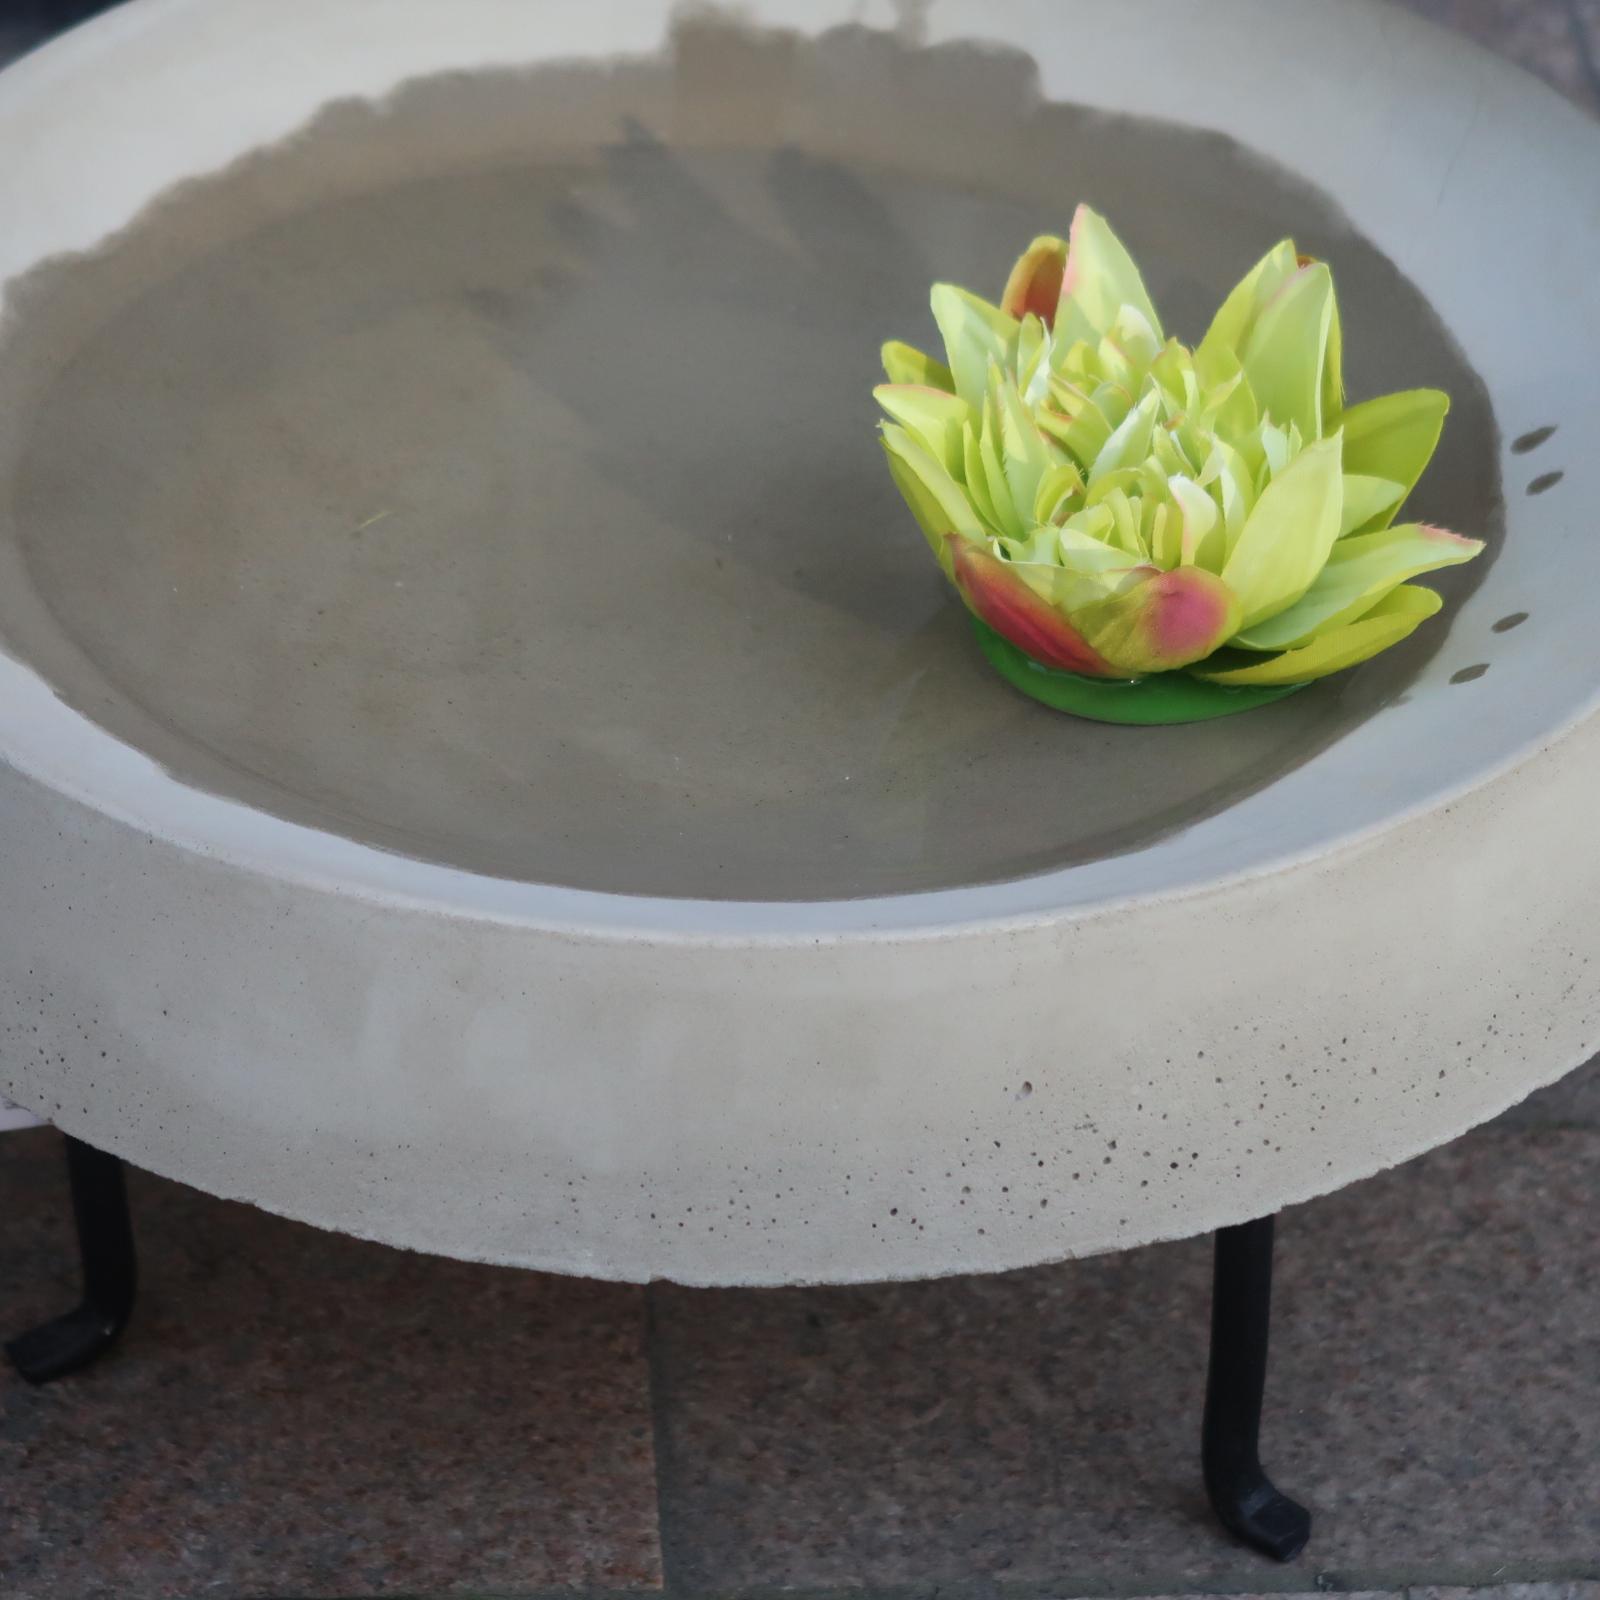 Lotusblomma grön